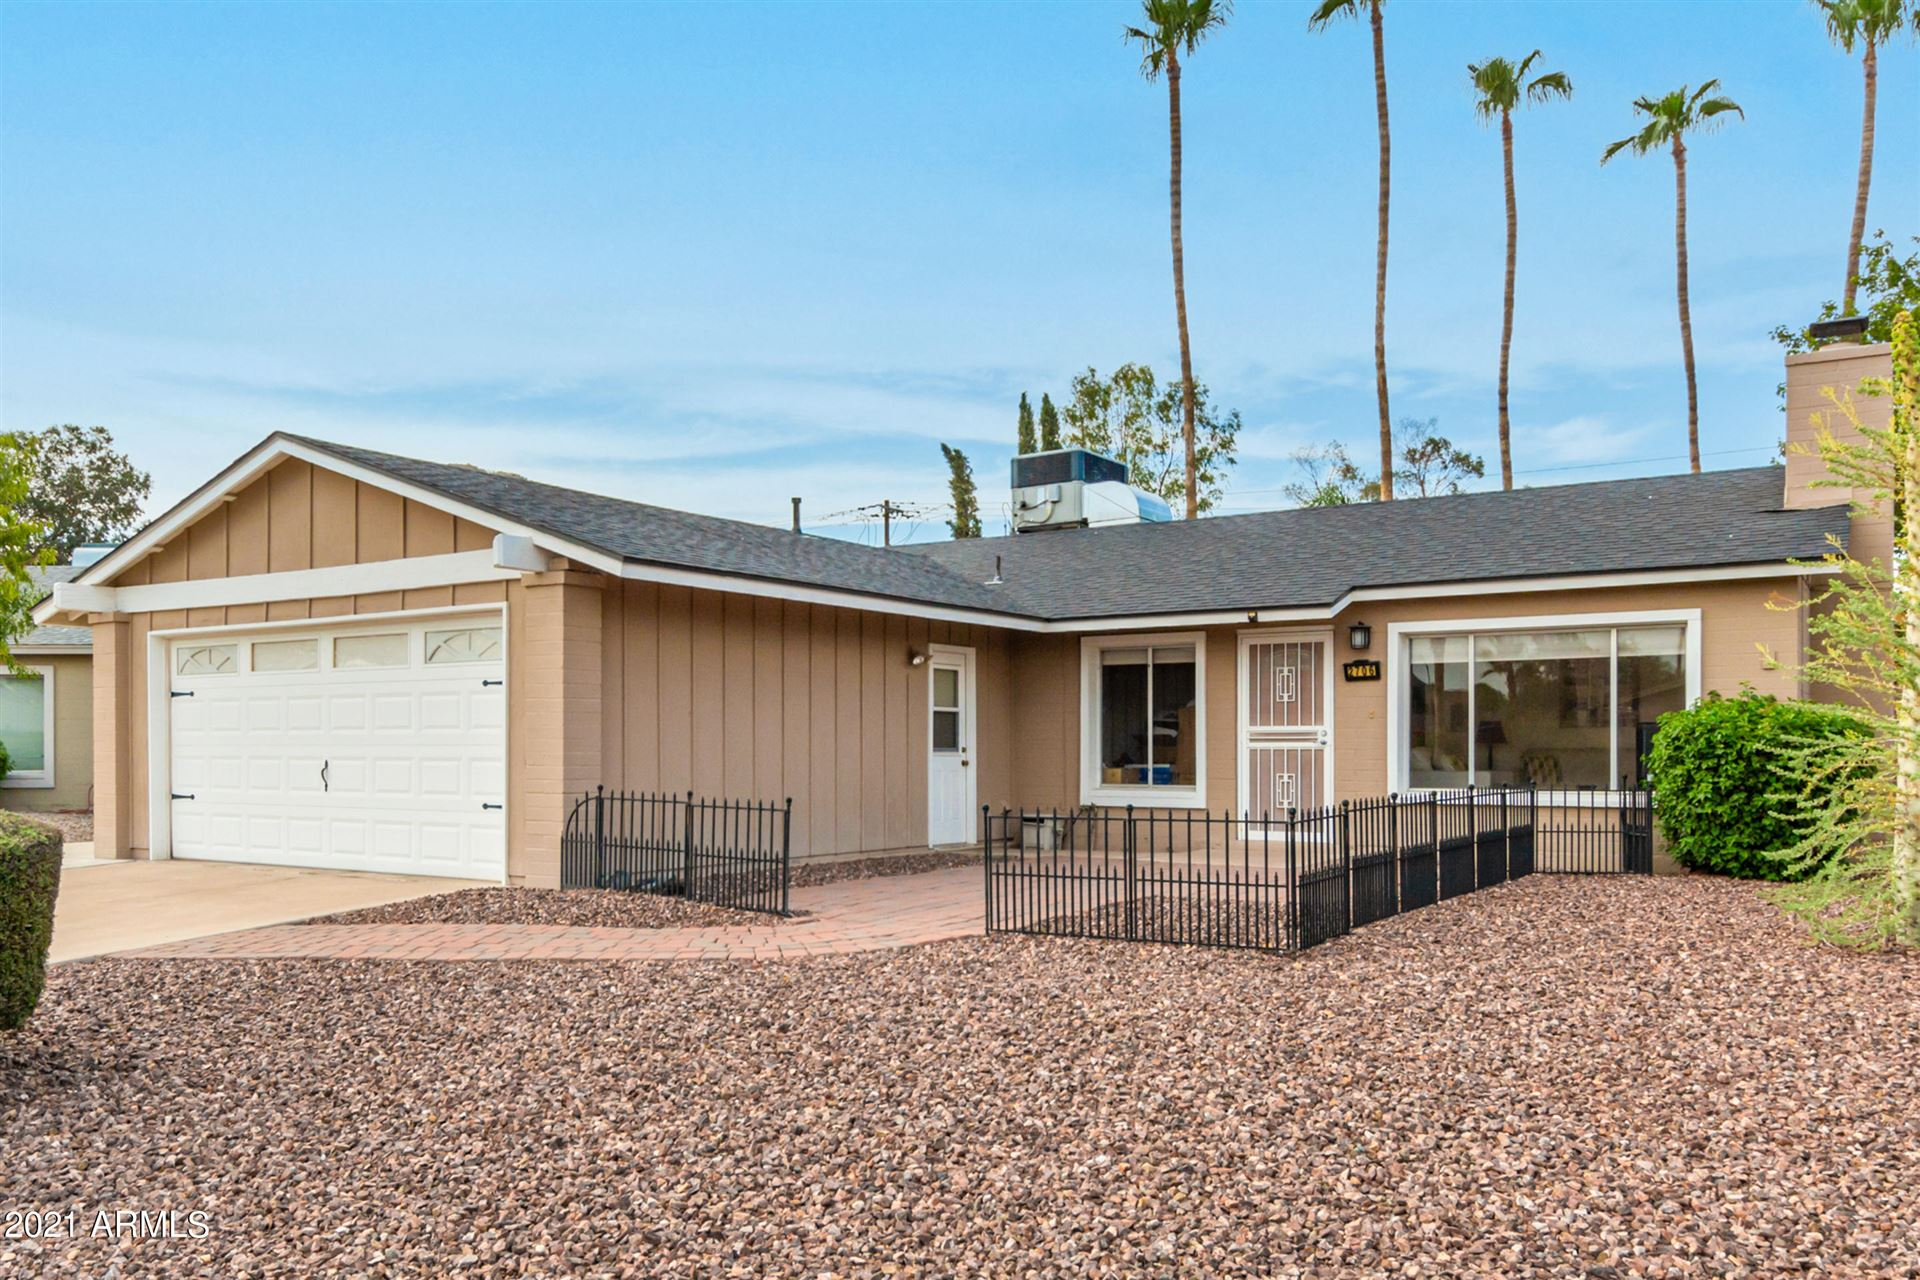 2706 E DAHLIA Drive, Phoenix, AZ 85032 - MLS#: 6278237